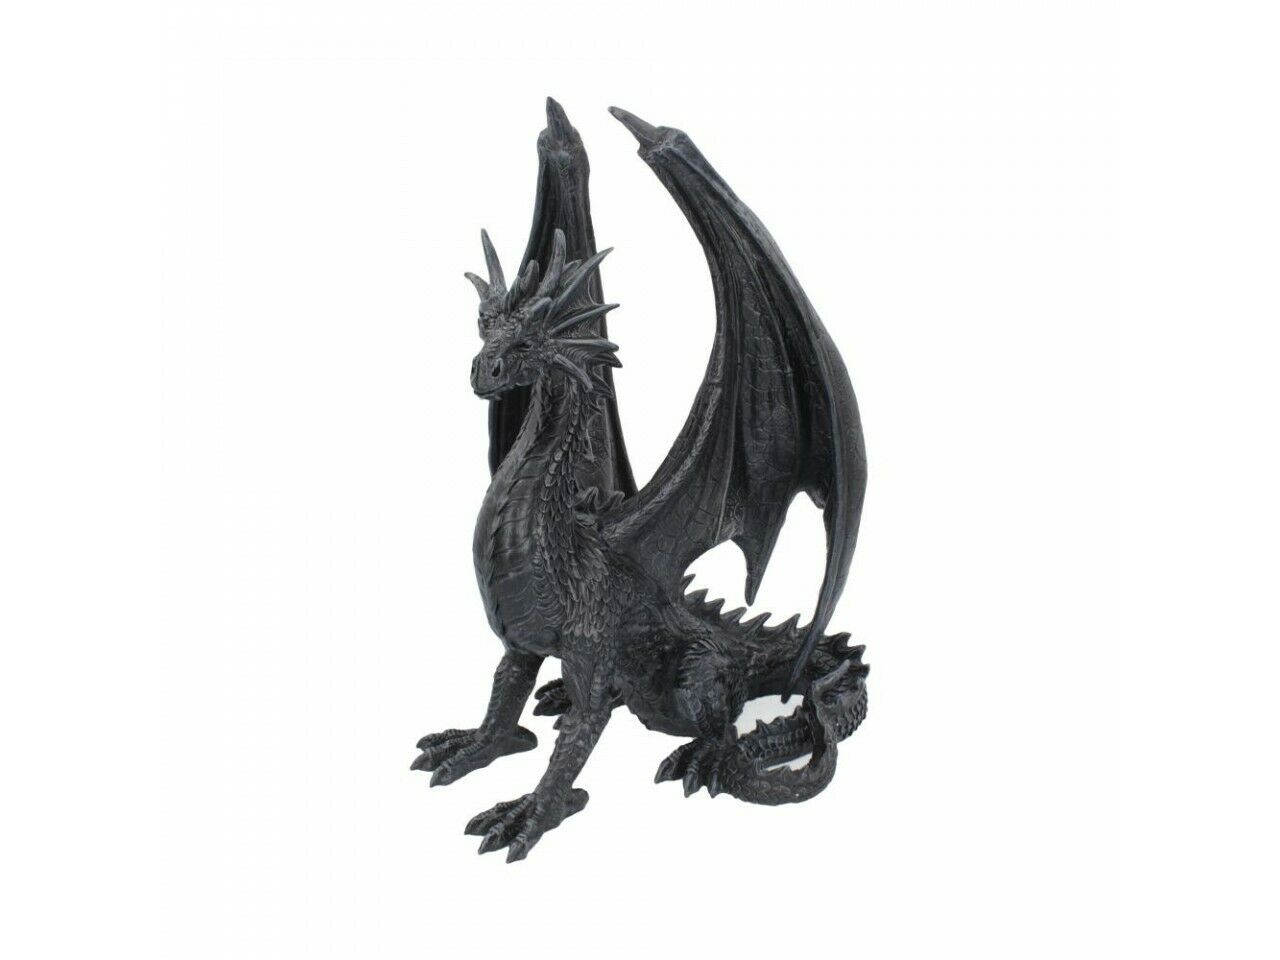 Steel Wing Skull 21cm Nemesis Now Dragon On Skull Steampunk Gothic Fantasy